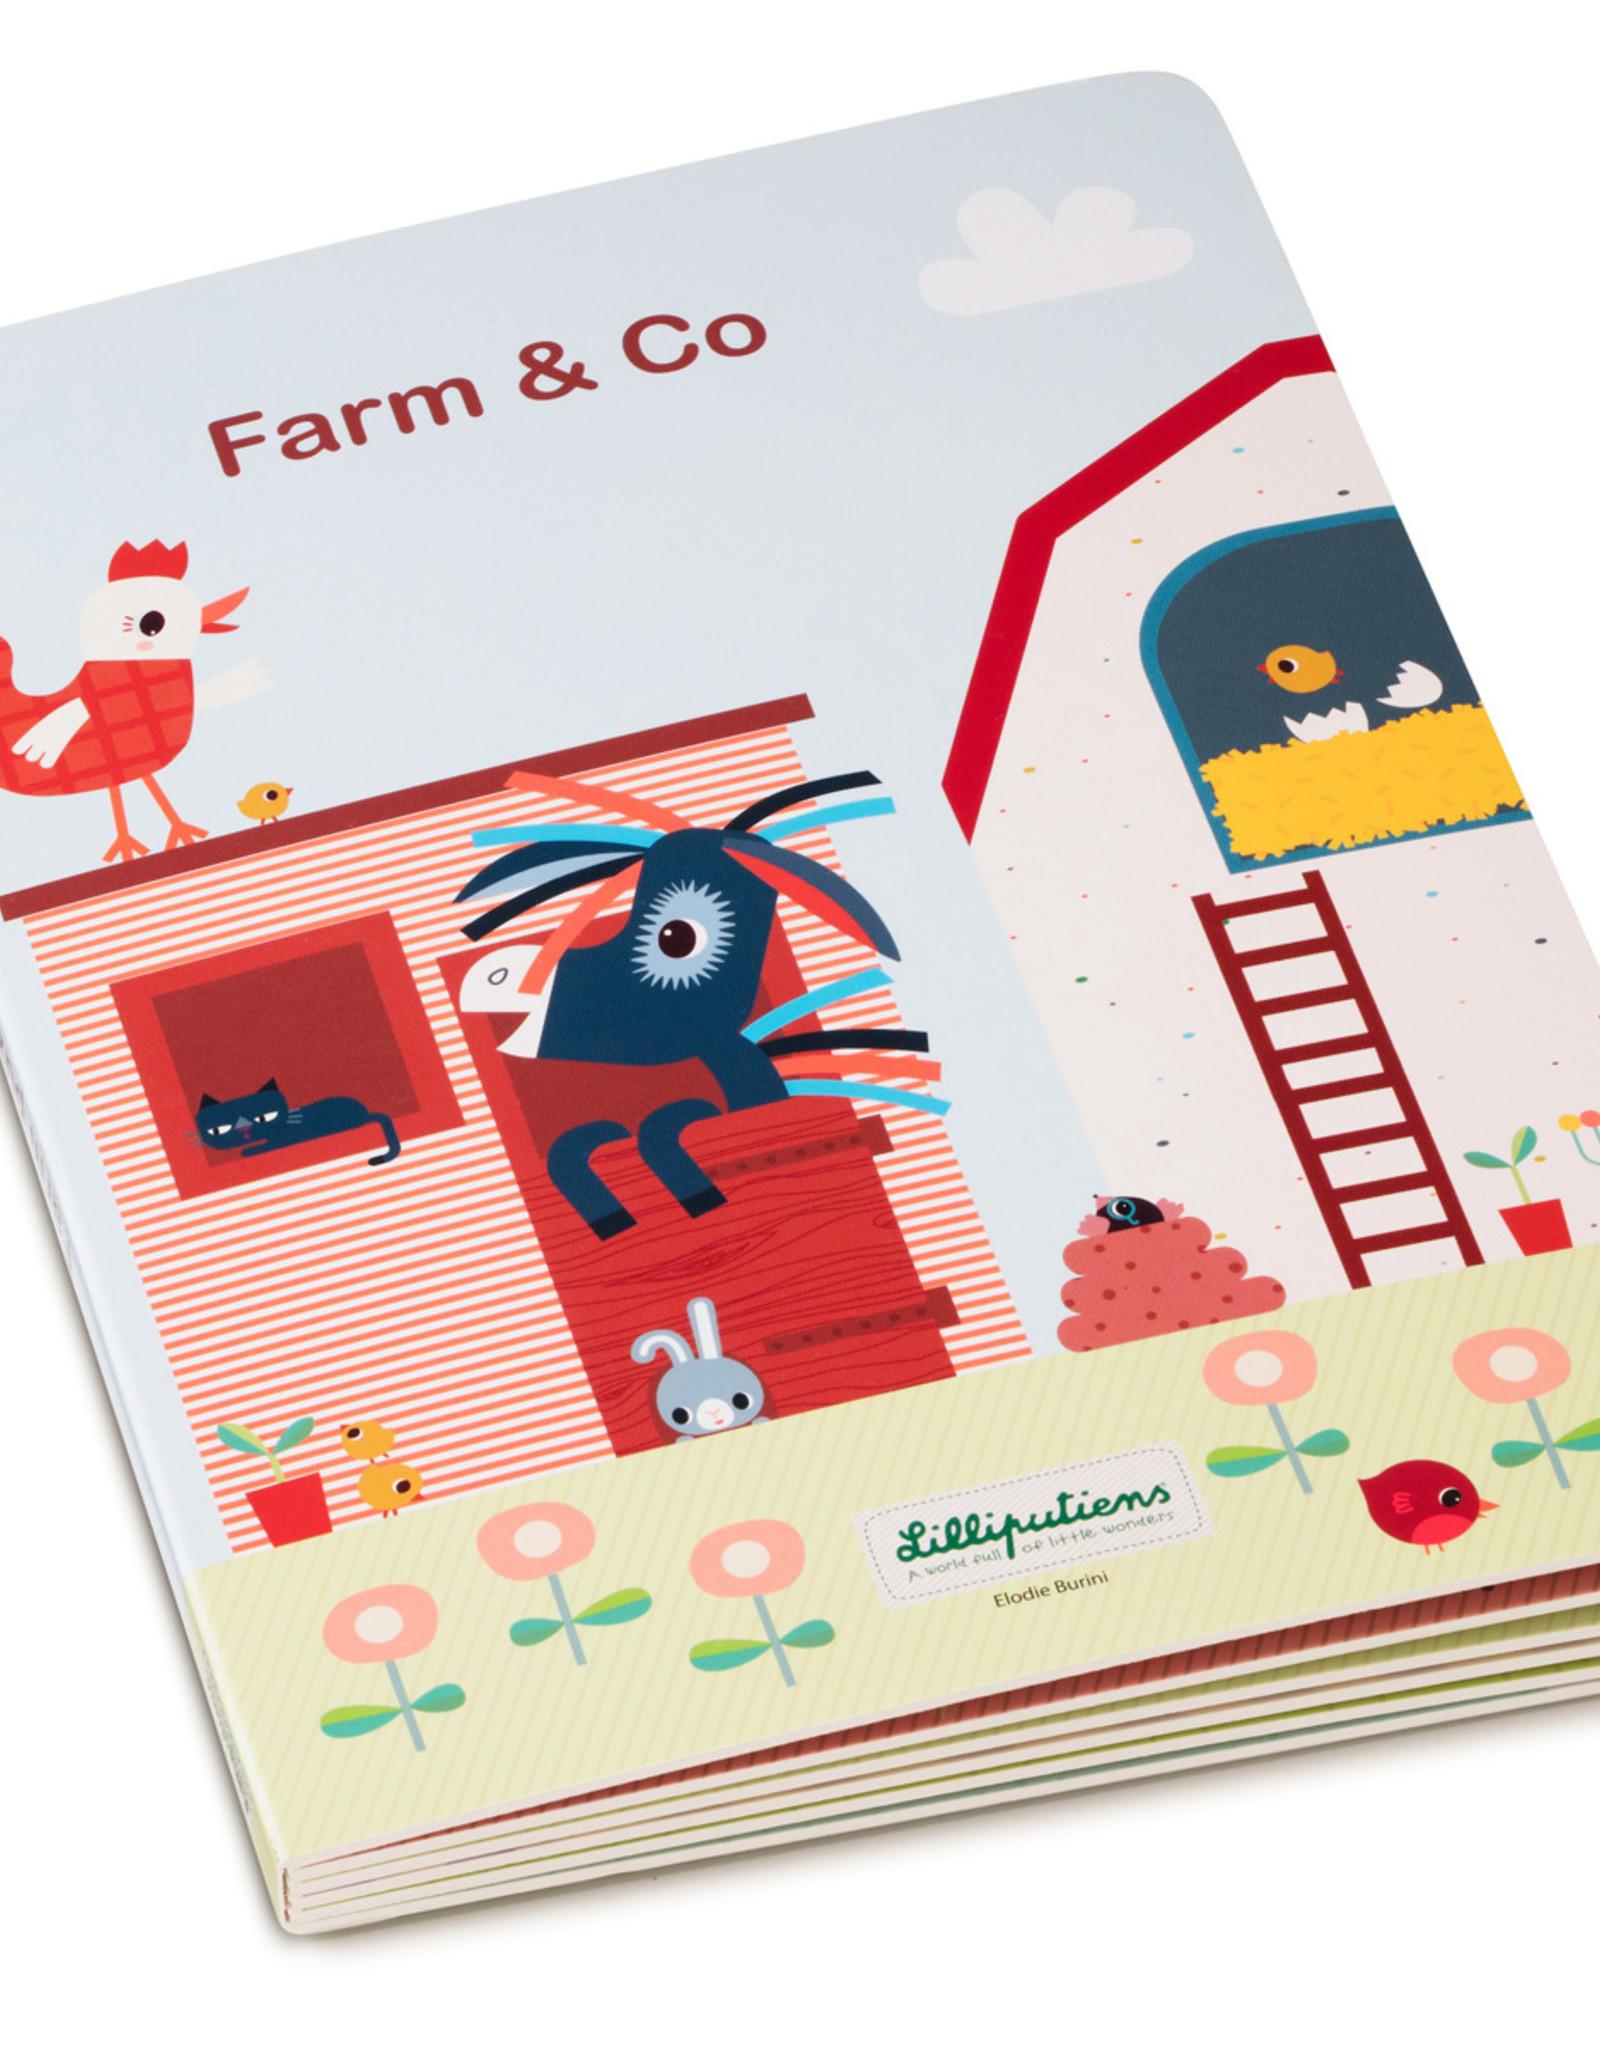 Lilliputiens Lilliputiens Farm & Co